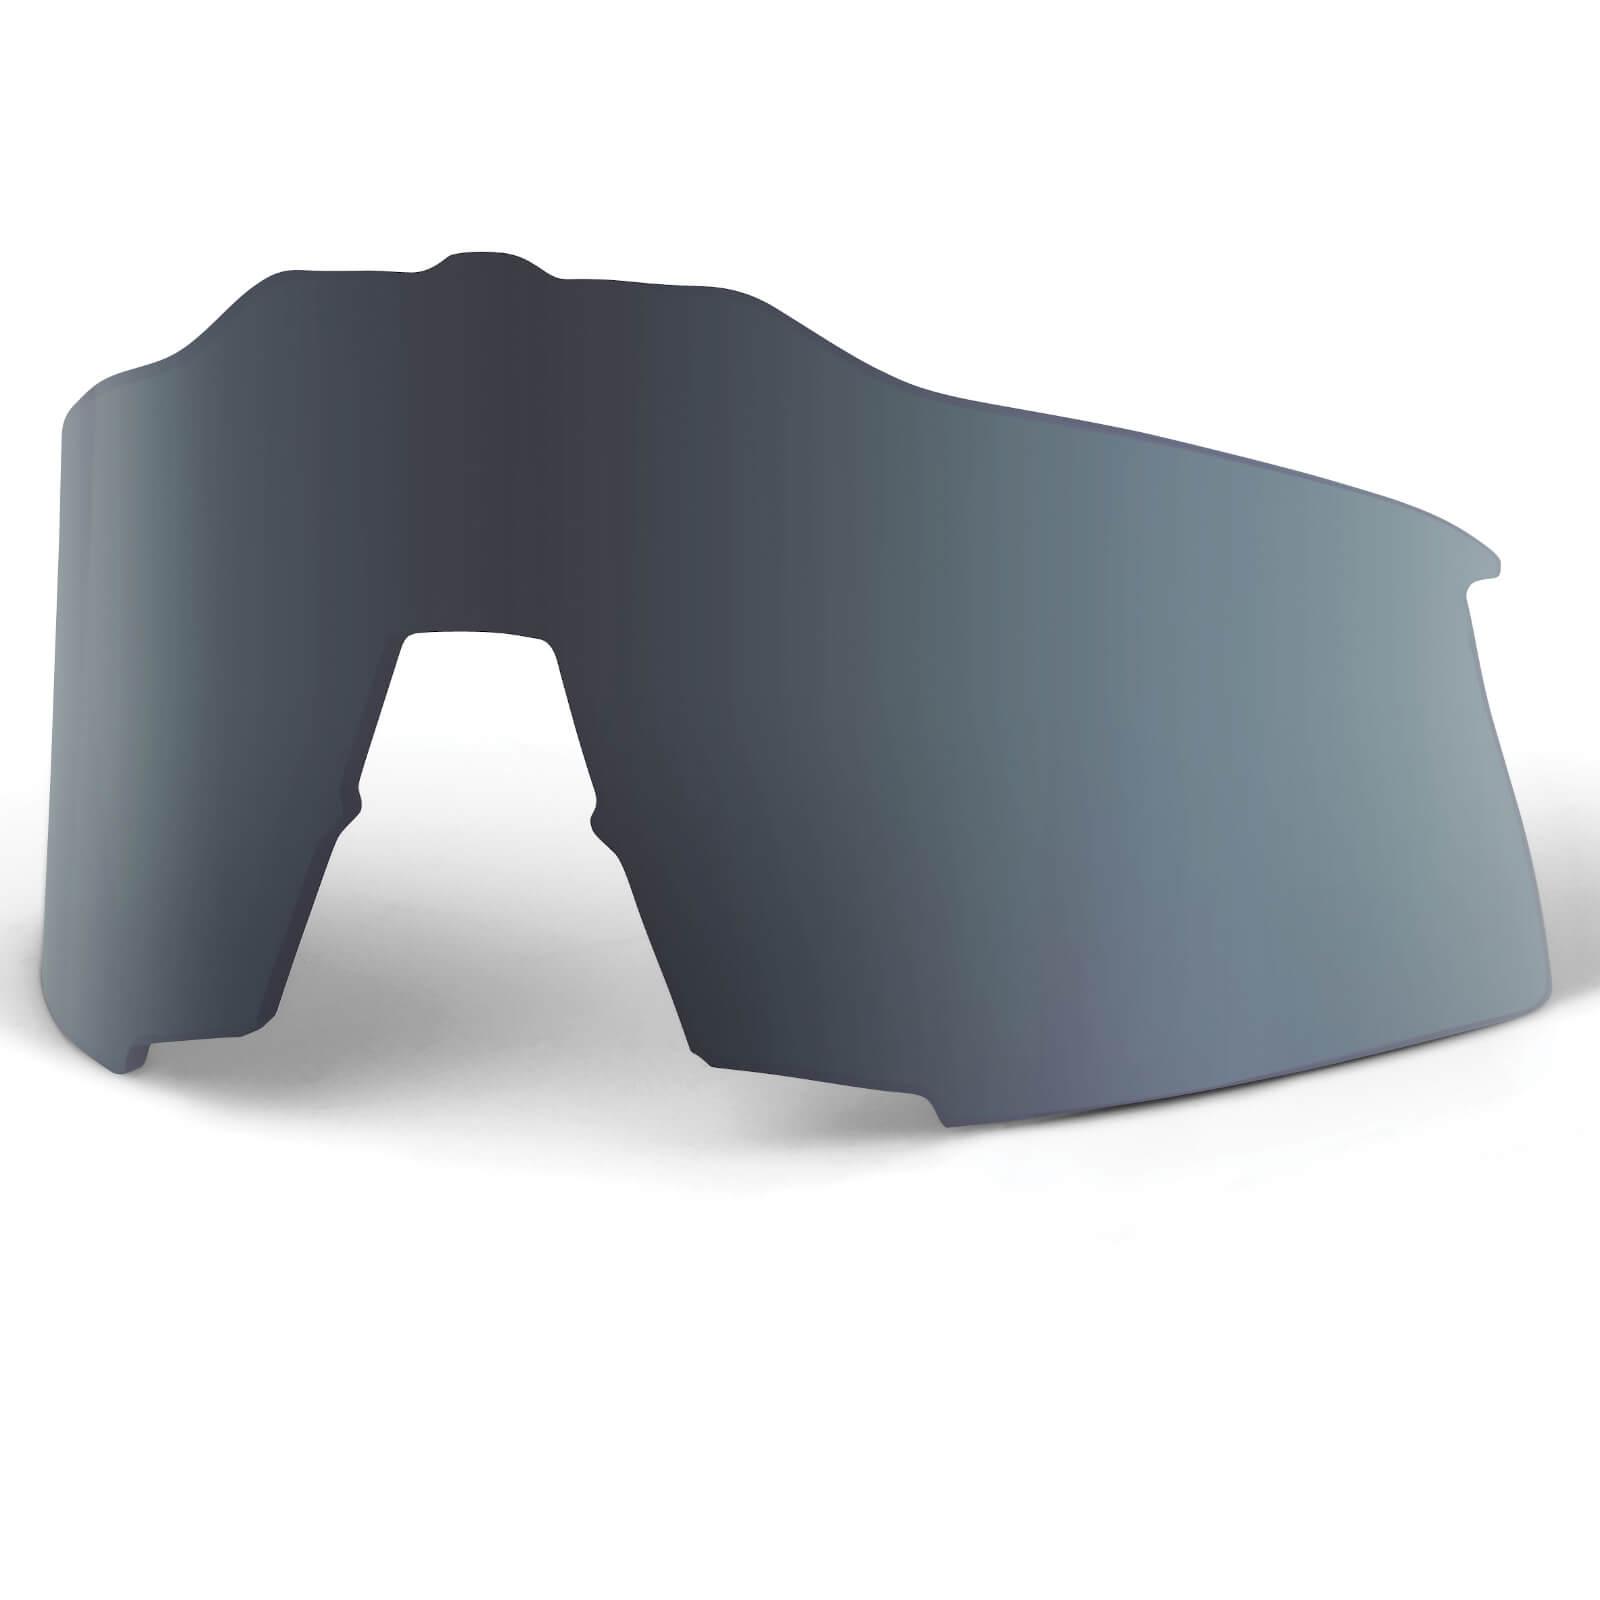 100% Speedcraft Replacement Lens - Smoke